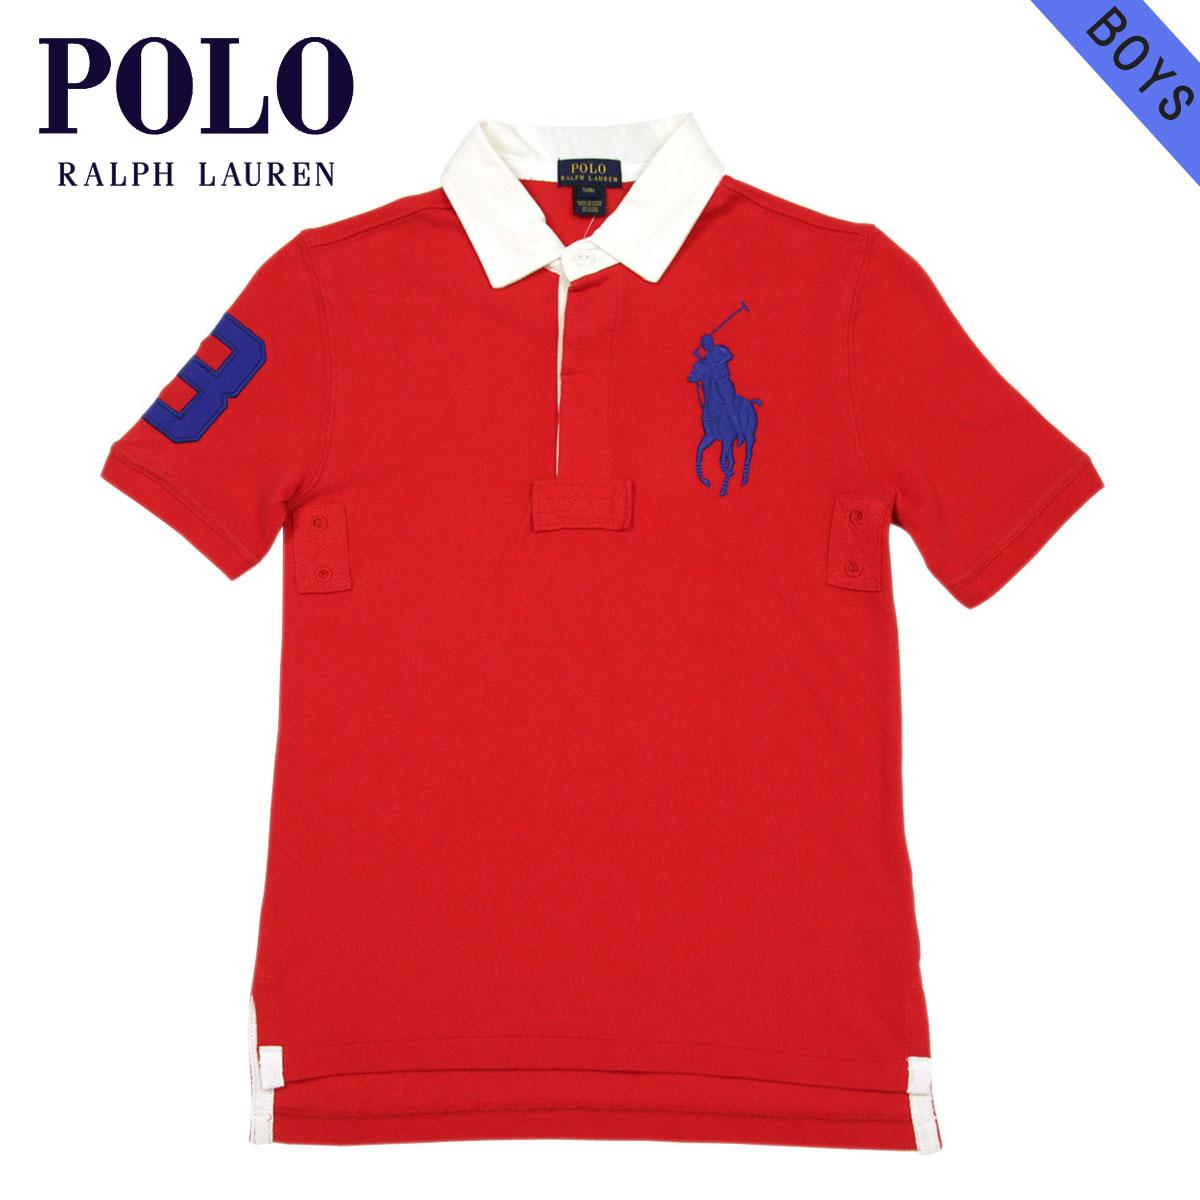 Ralph Lauren Boys Big Children's Kids 30 off Shirt Article Polo Children Pony D20s30 Sale Clothes Regular NP80wnXZOk